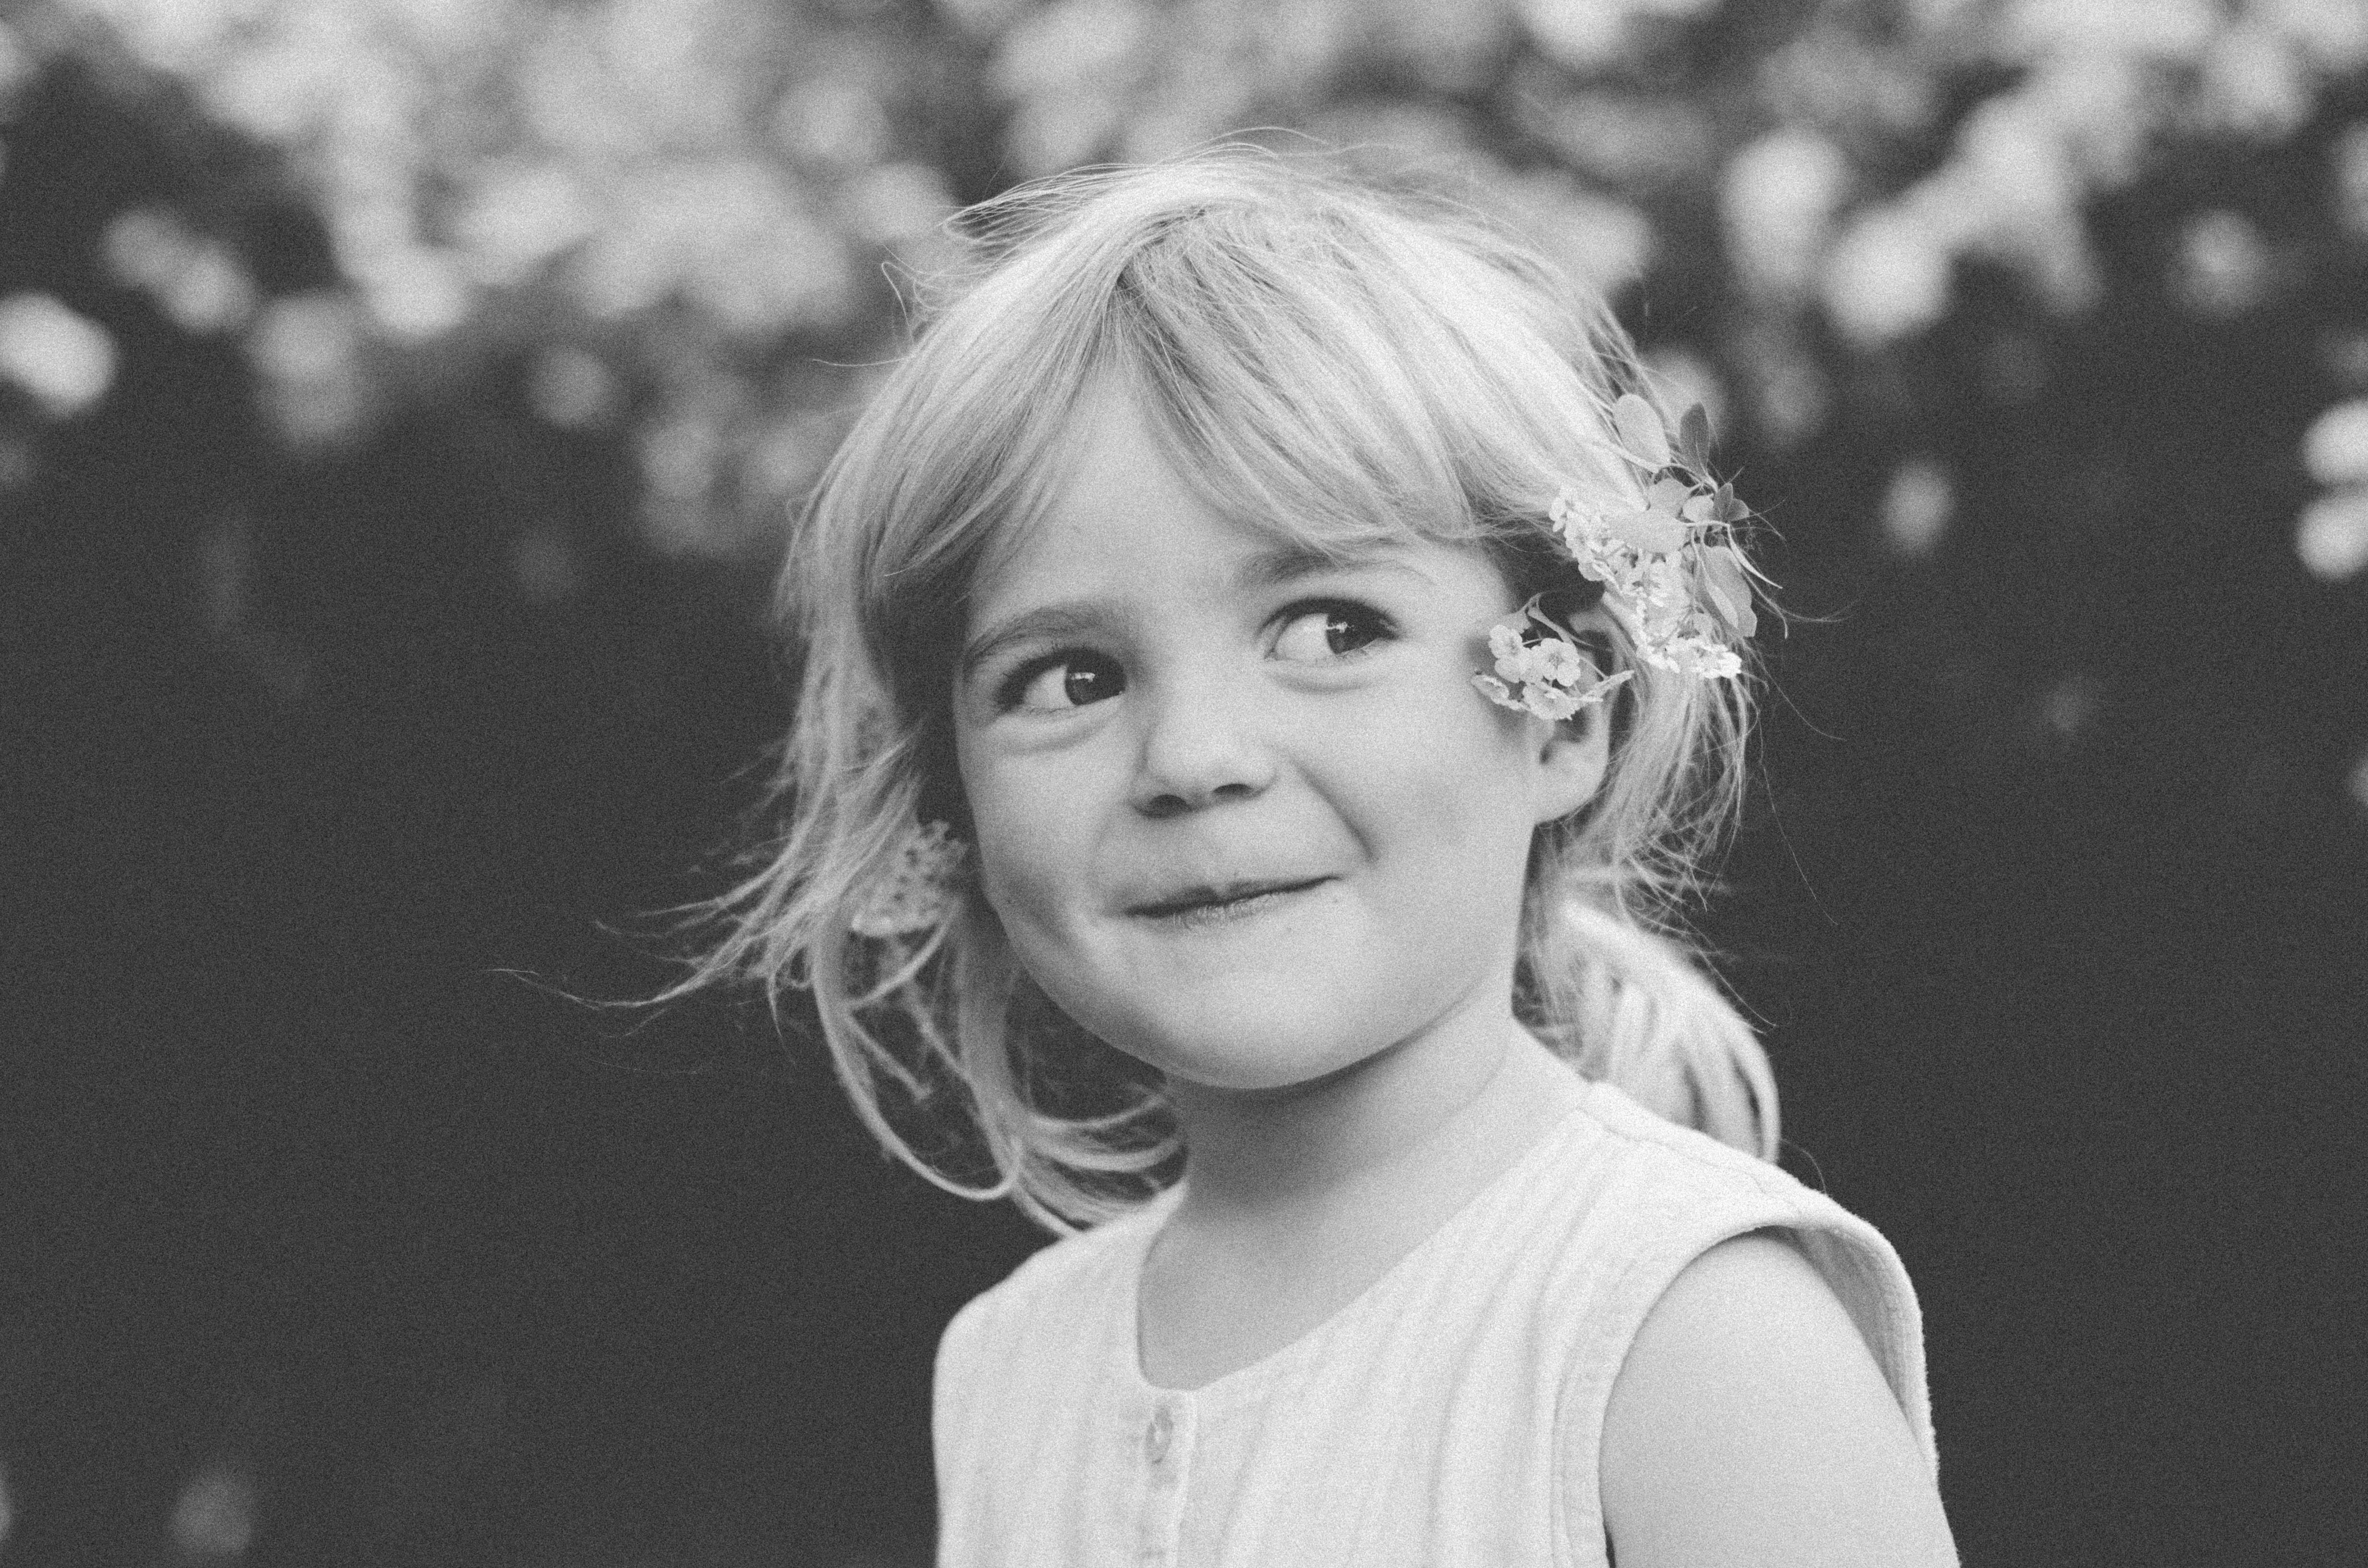 Marcia Friese Fotografie,Familienfotos Zuhause,Geschwisterfotoshooting,Familienfotoshooting,Schwangerschaftsfotoshooting,Berlin,portrait,Kinderfotos,kinderportrait